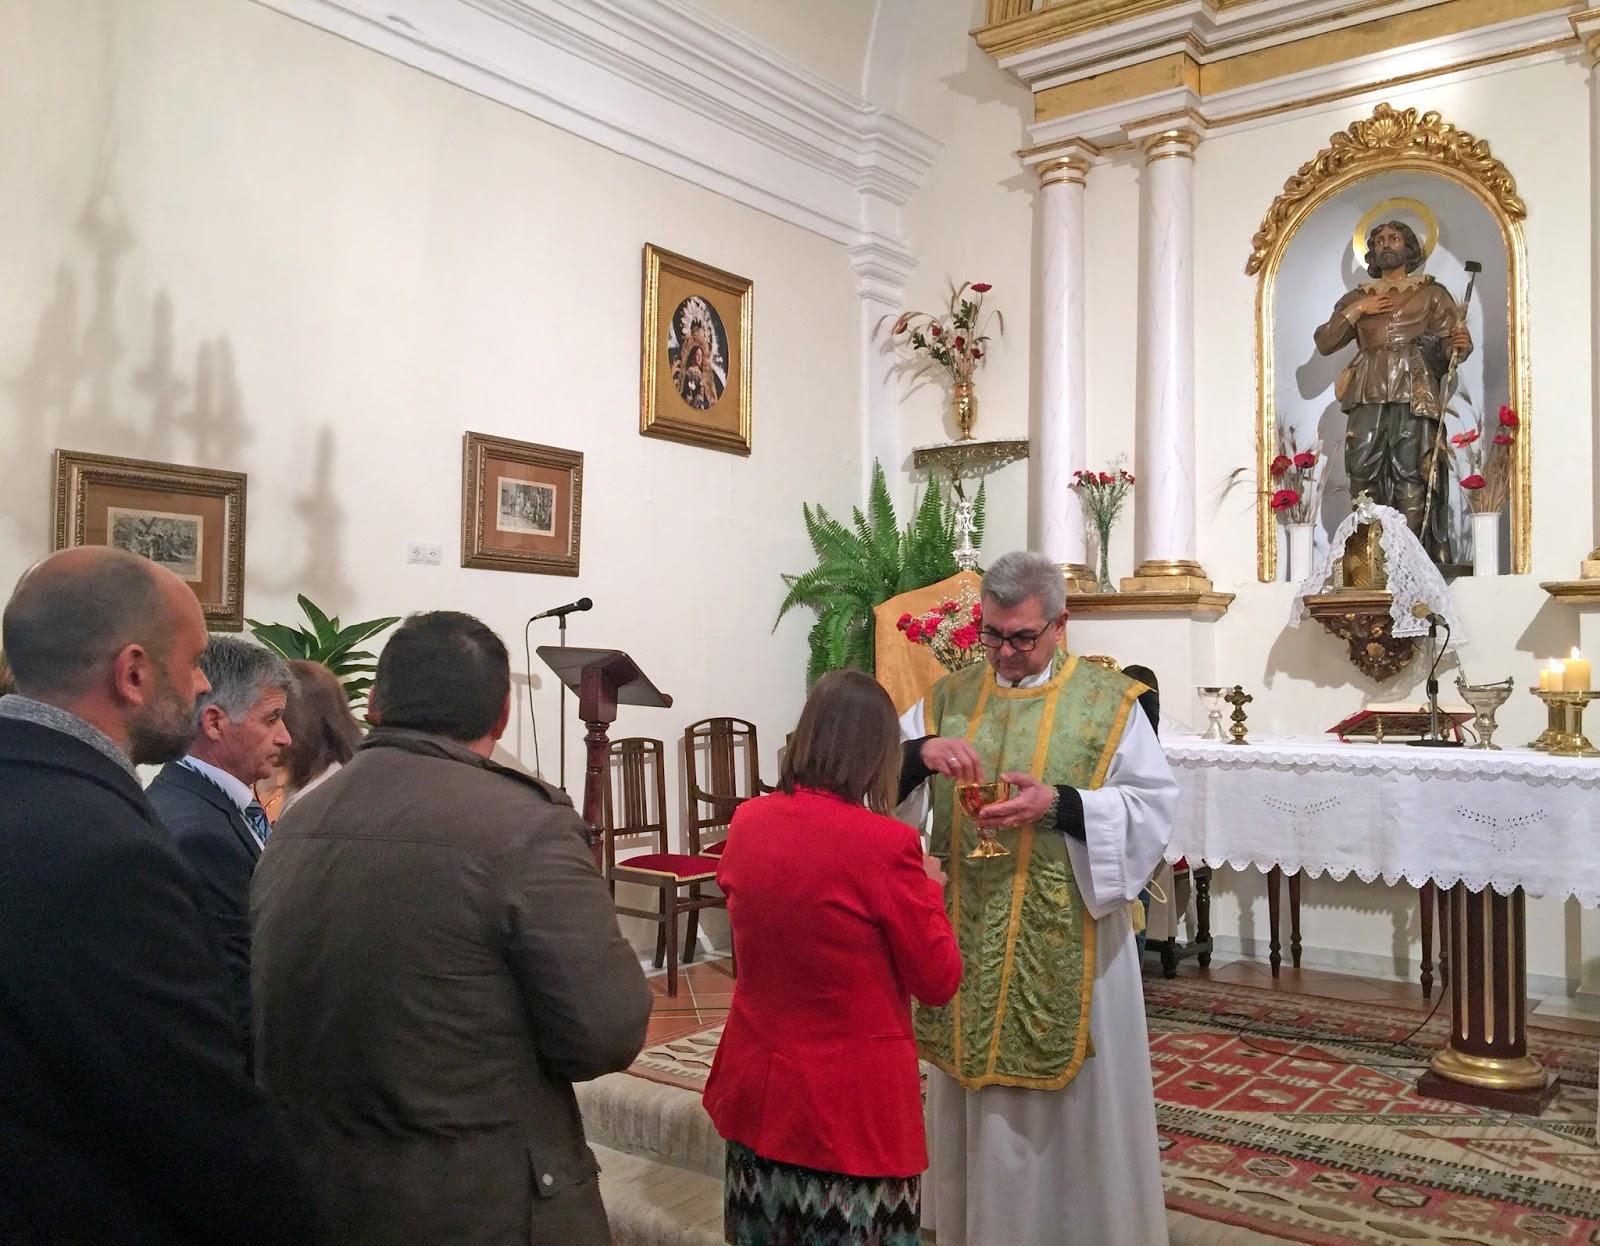 Hermandad de san isidro labrador de periana m laga 2018 for Pasion amistad malaga